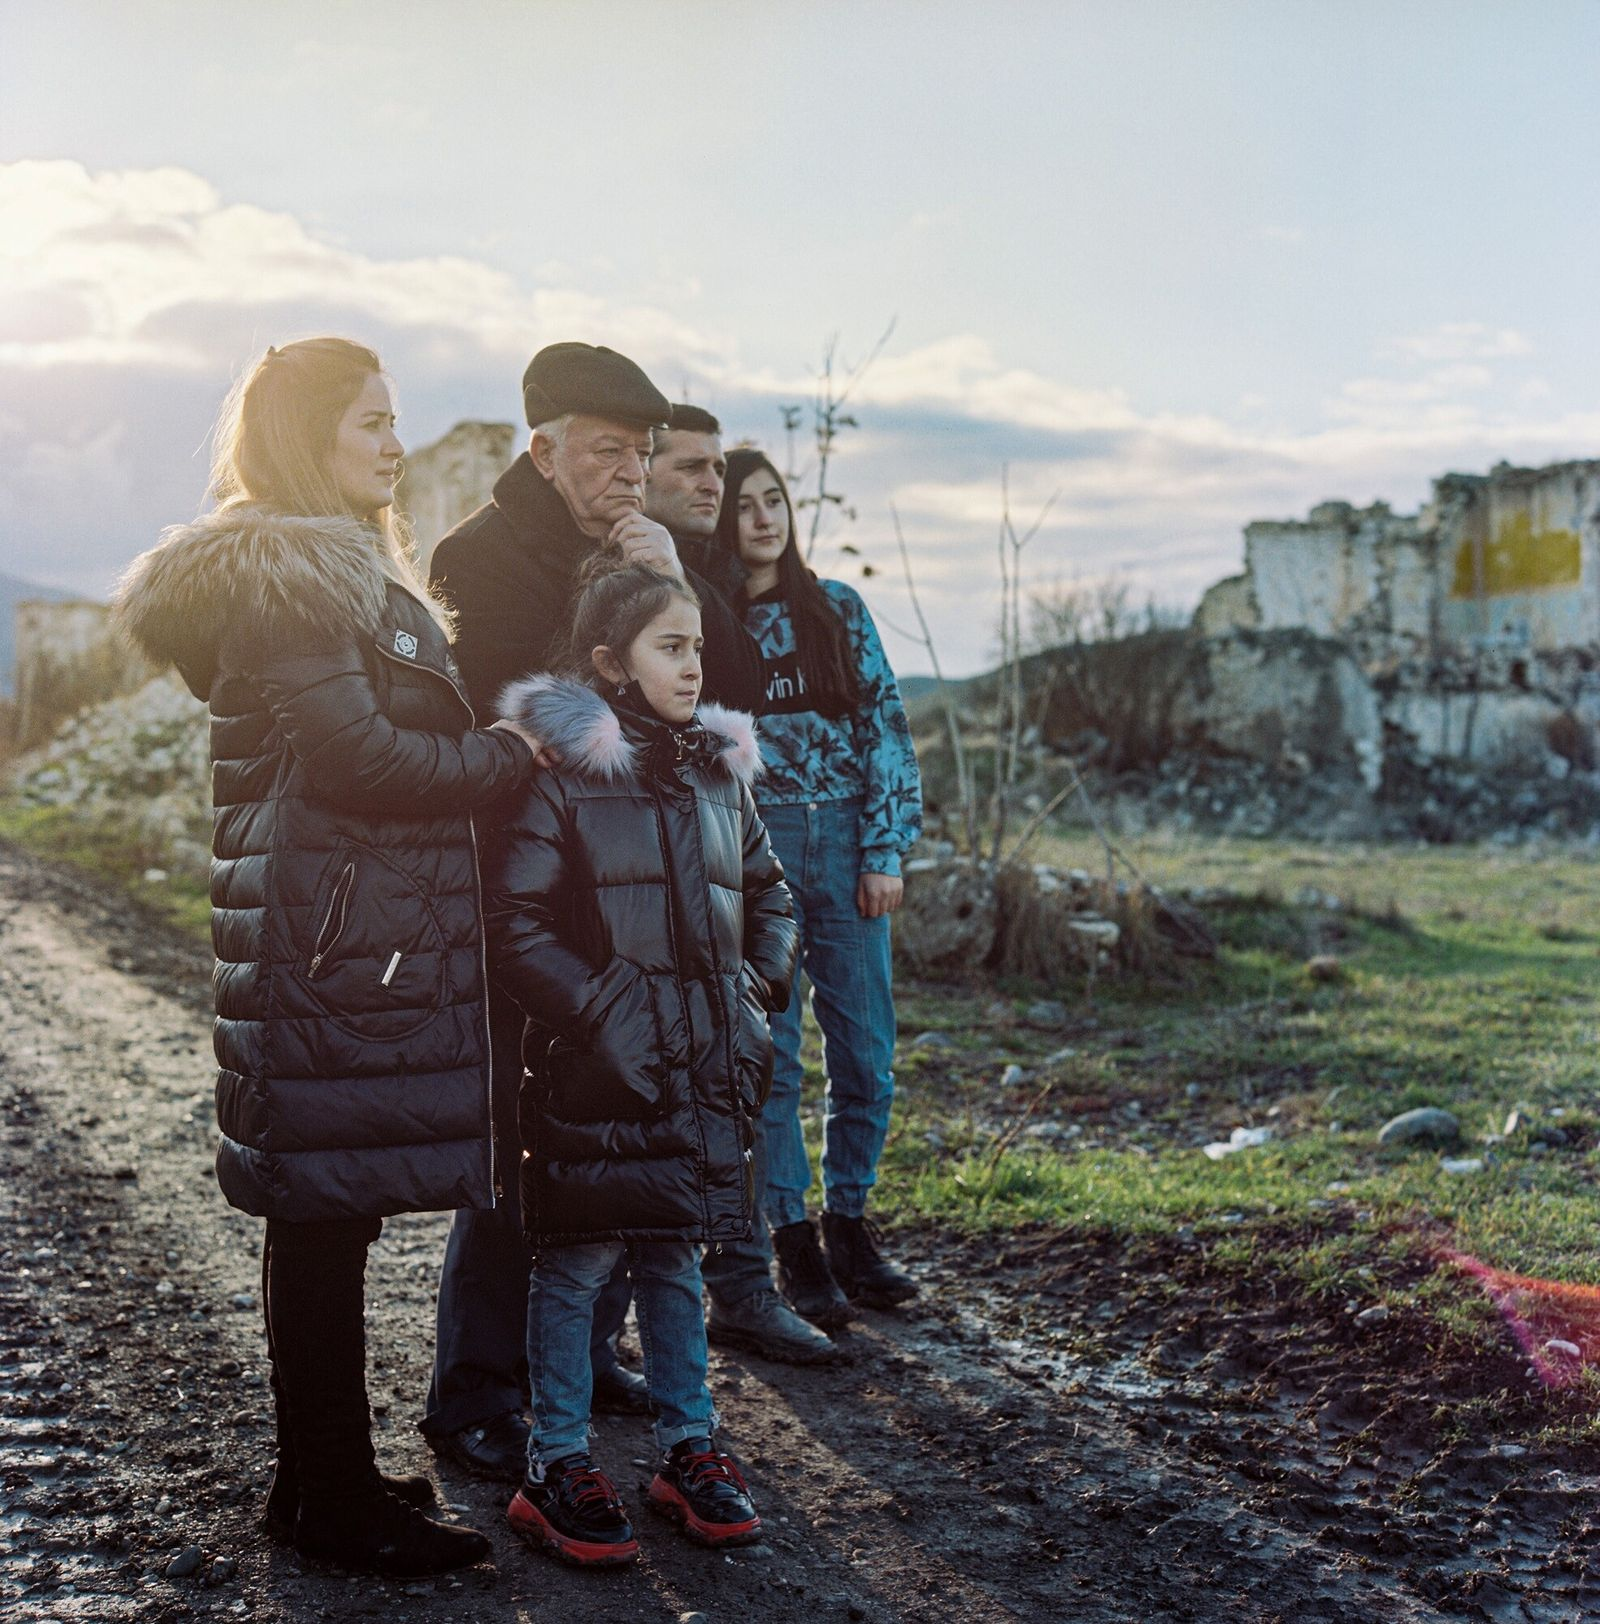 The Guliyev family (left) visited their native village of Qasımlı in Ağdam in search of what ...